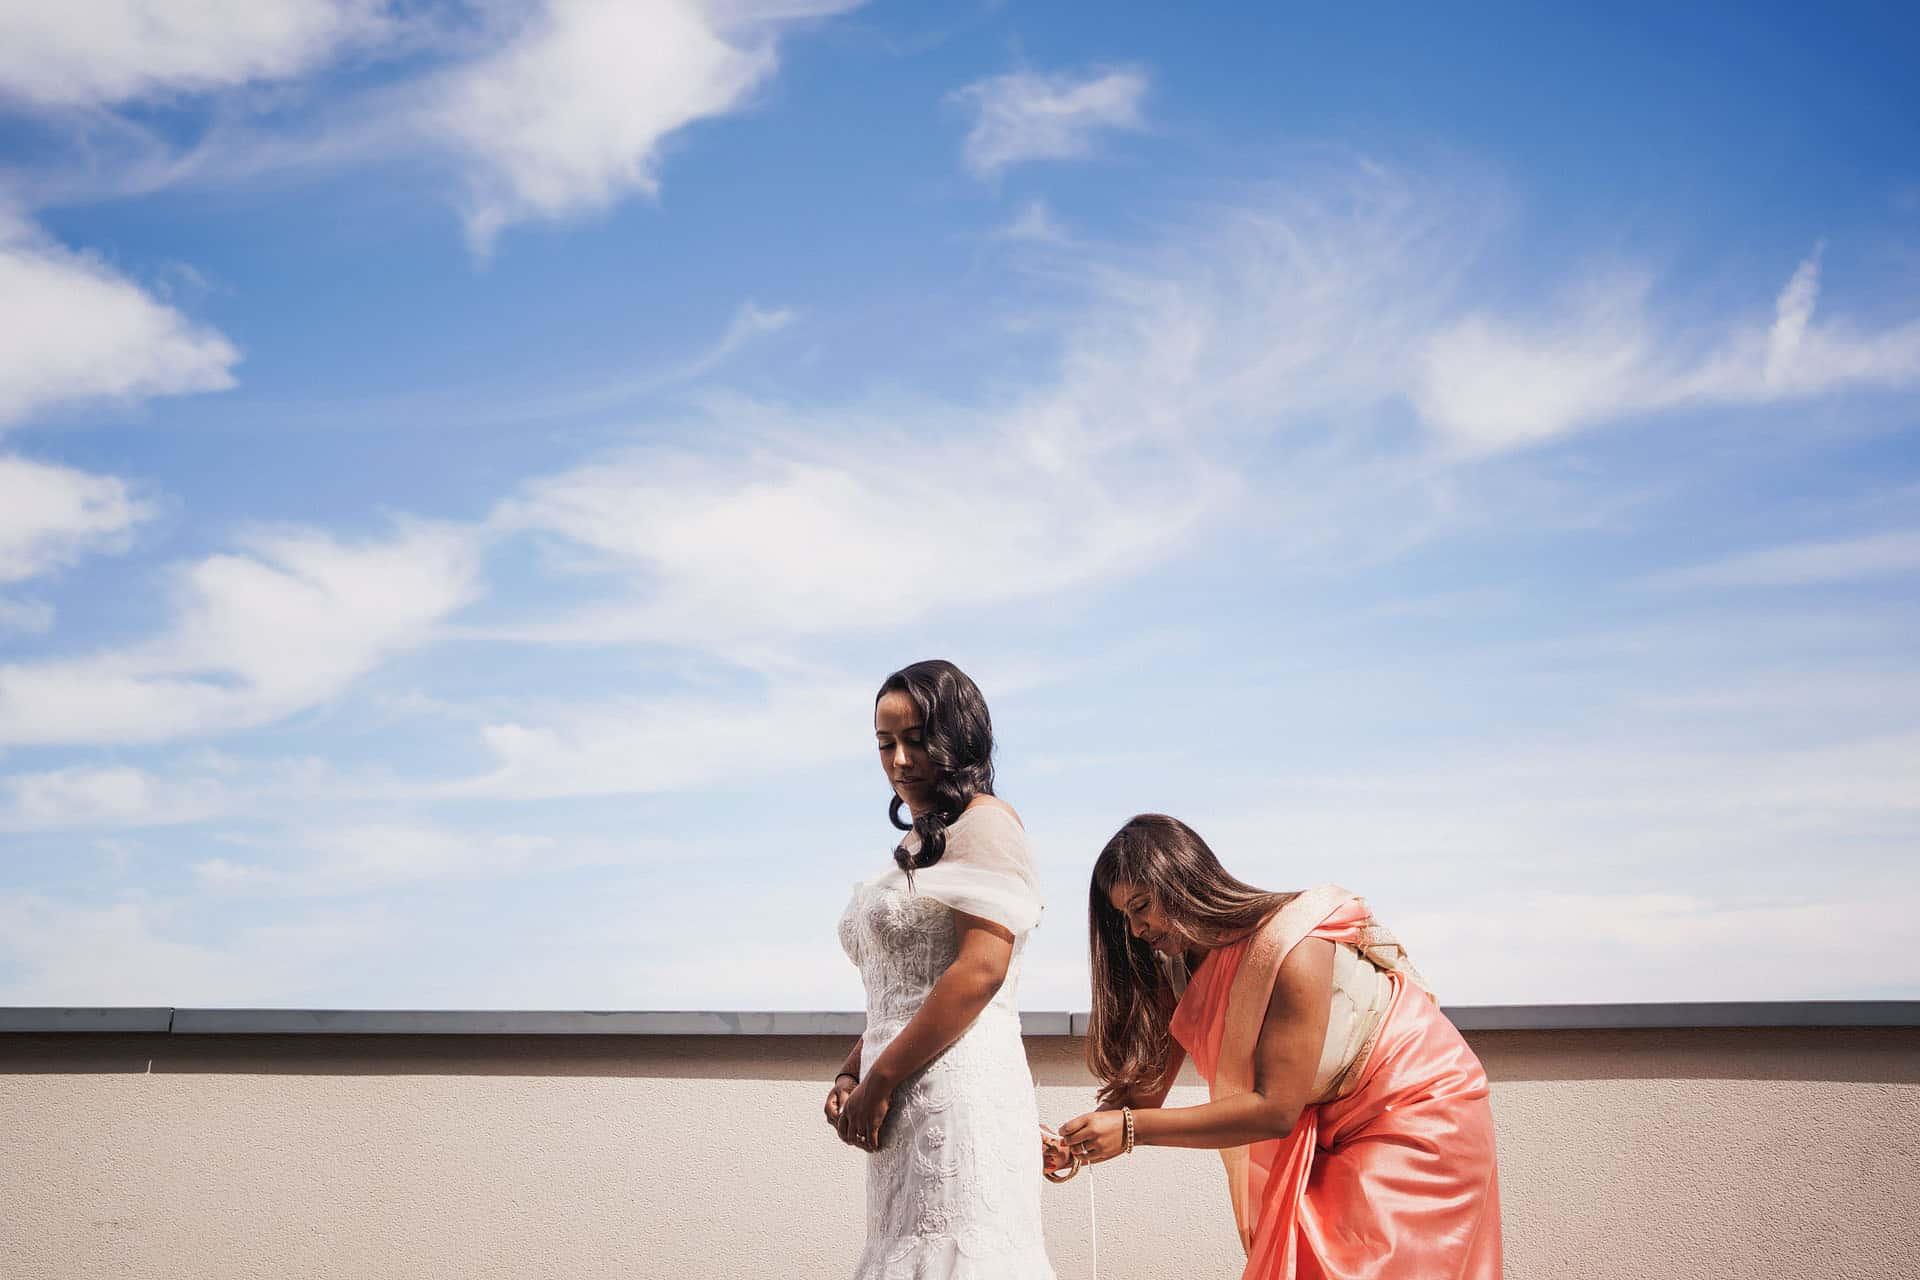 painsill conservatory wedding photographer